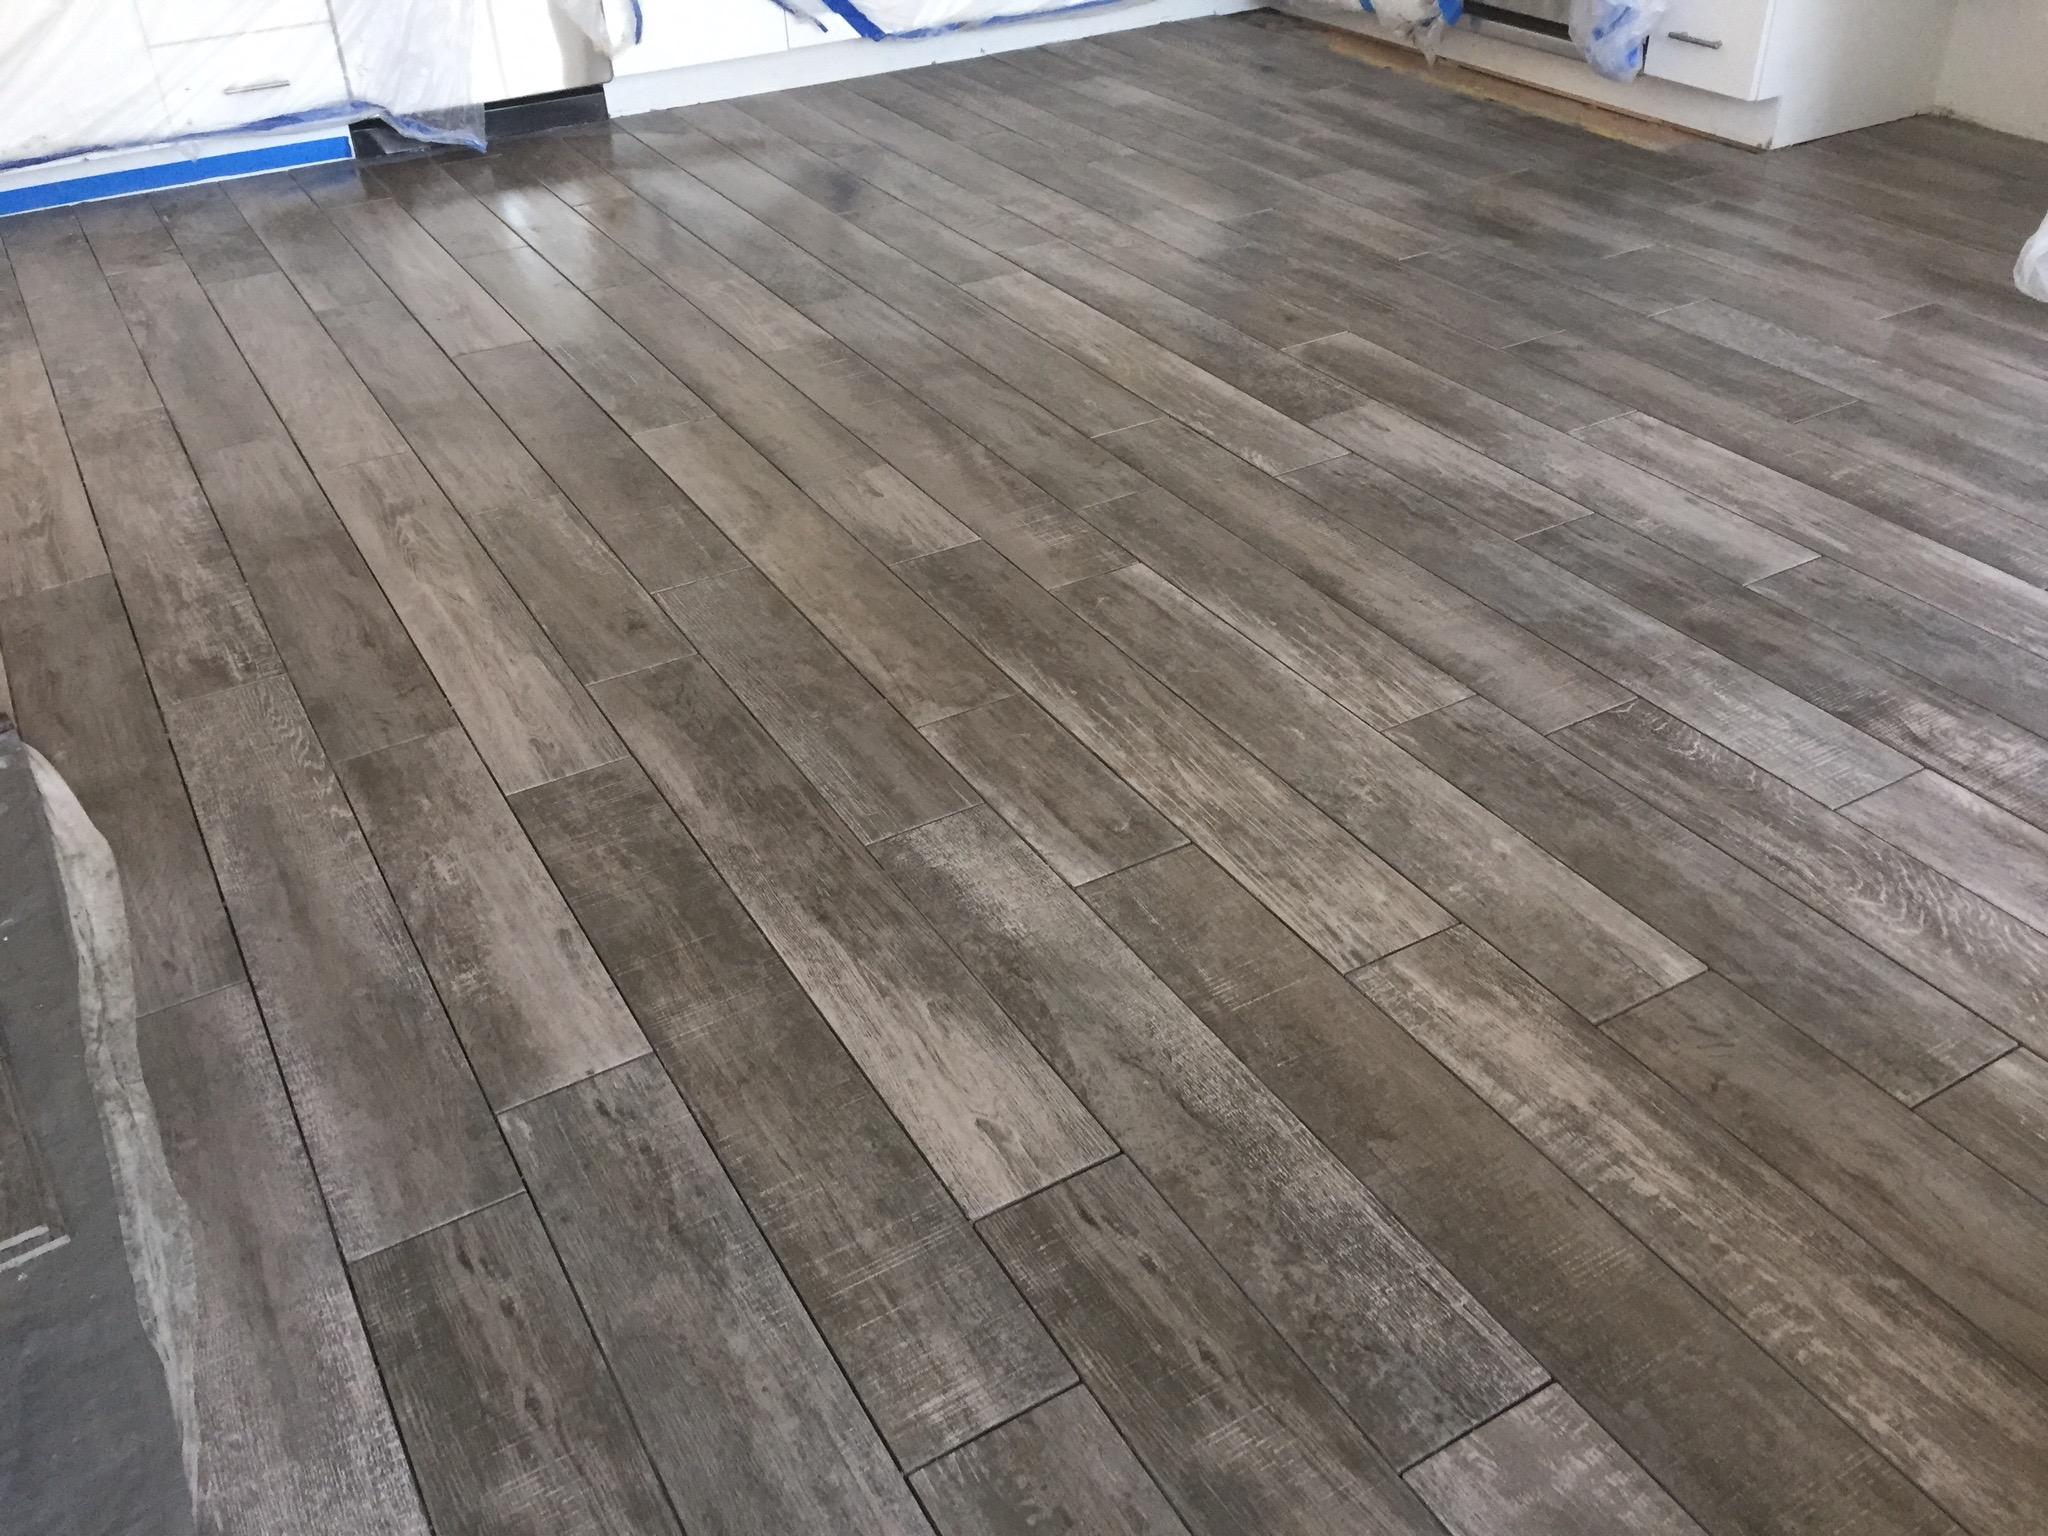 Plank Tile Installed LB CA